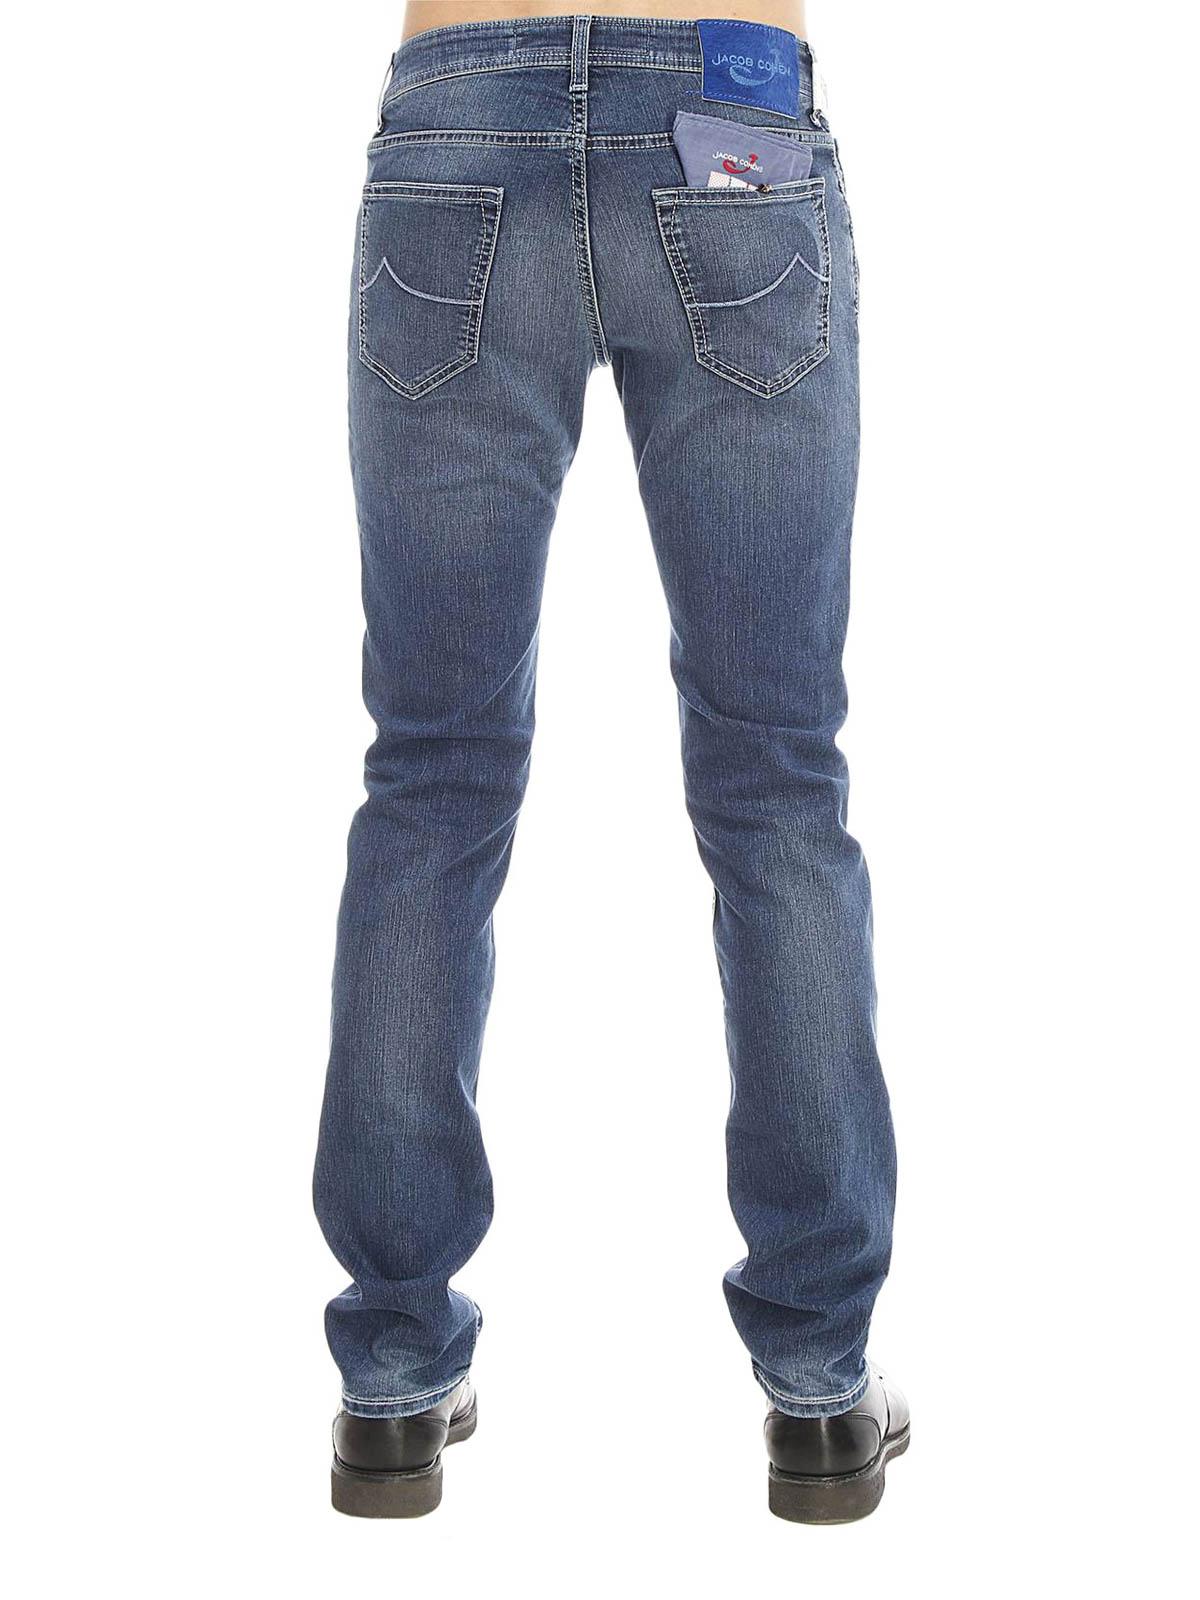 jeans slavato jacob cohen jeans dritti a sigaretta ikrix. Black Bedroom Furniture Sets. Home Design Ideas